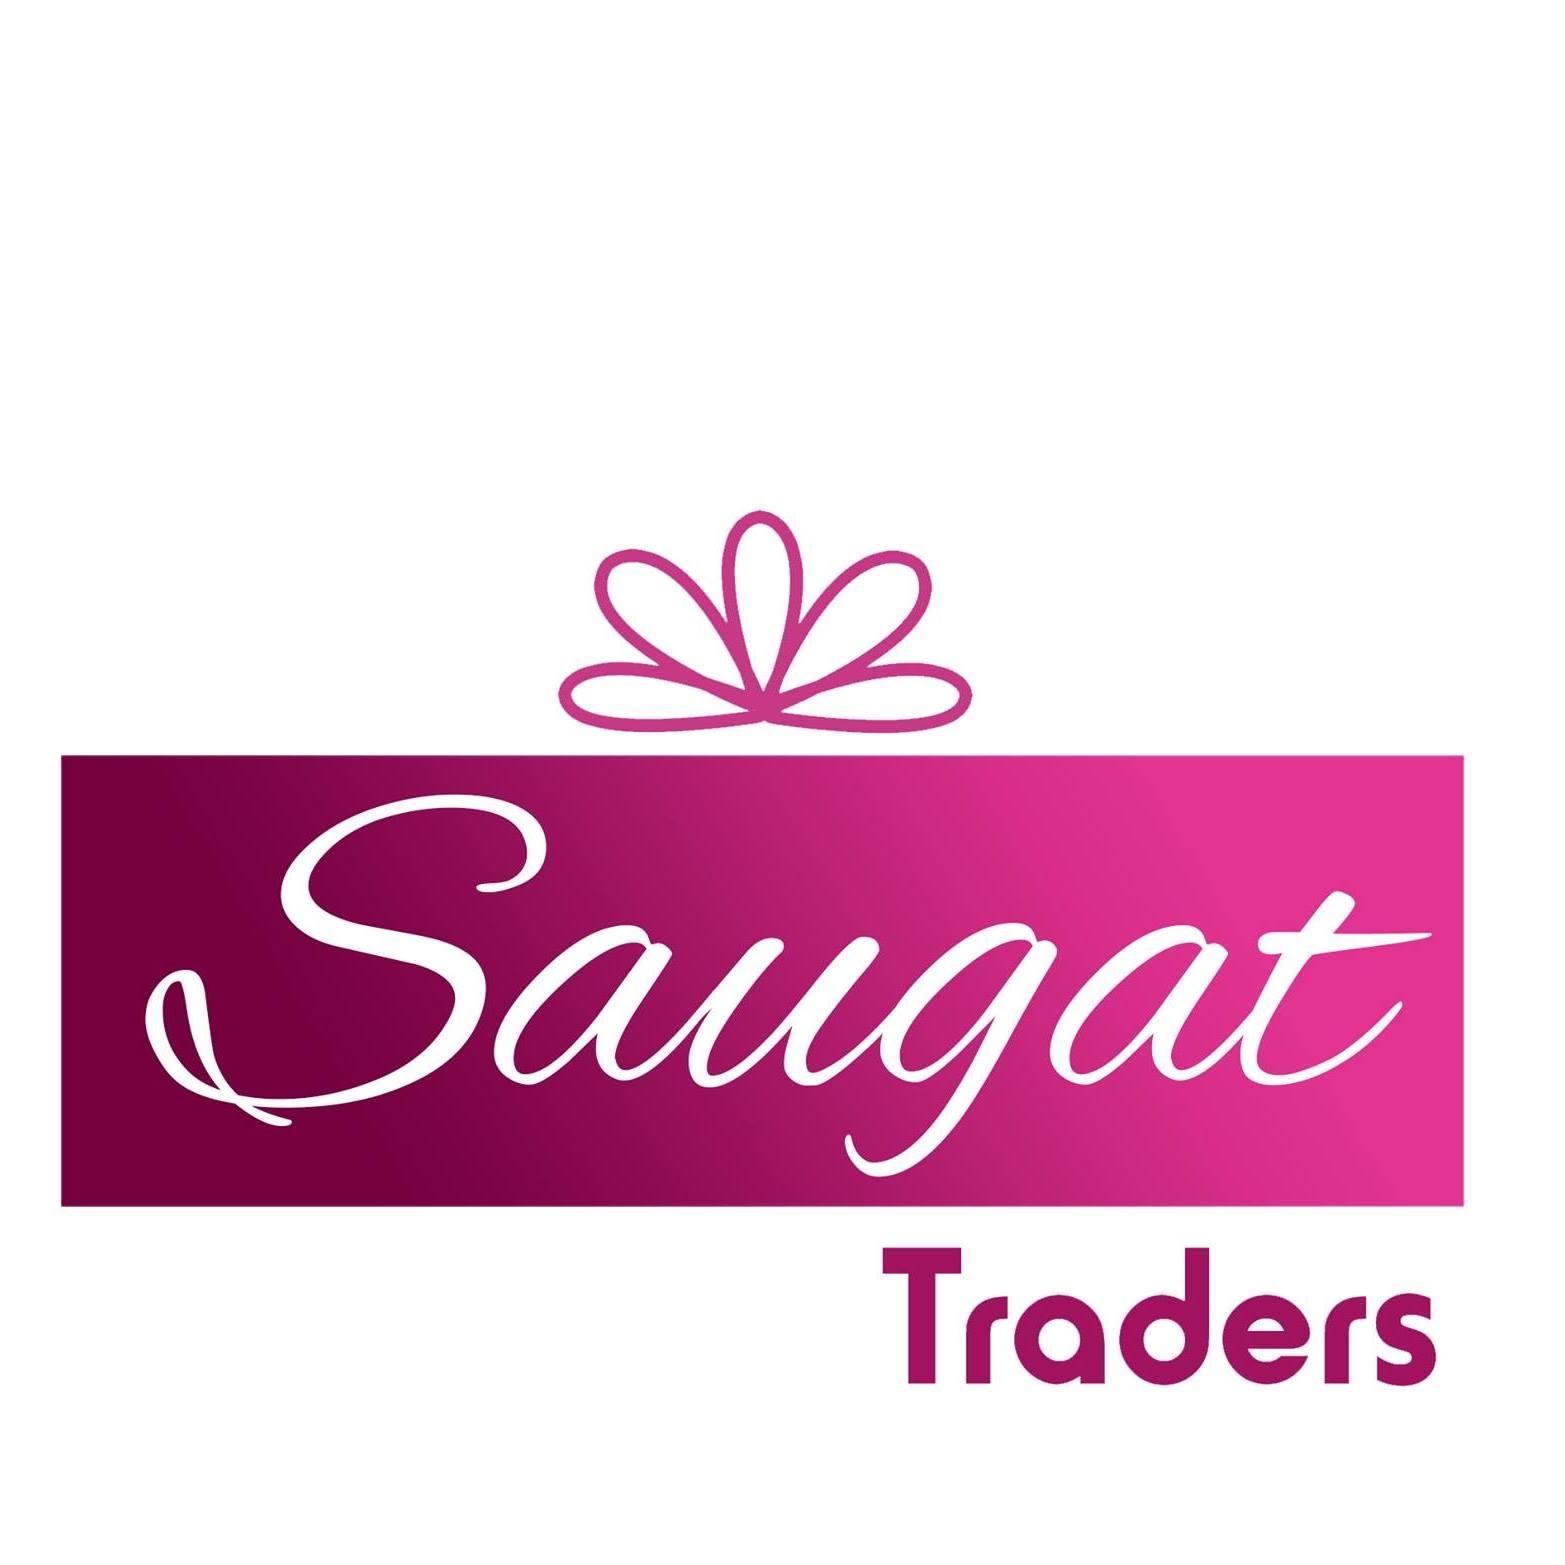 SAUGATONLINE.com